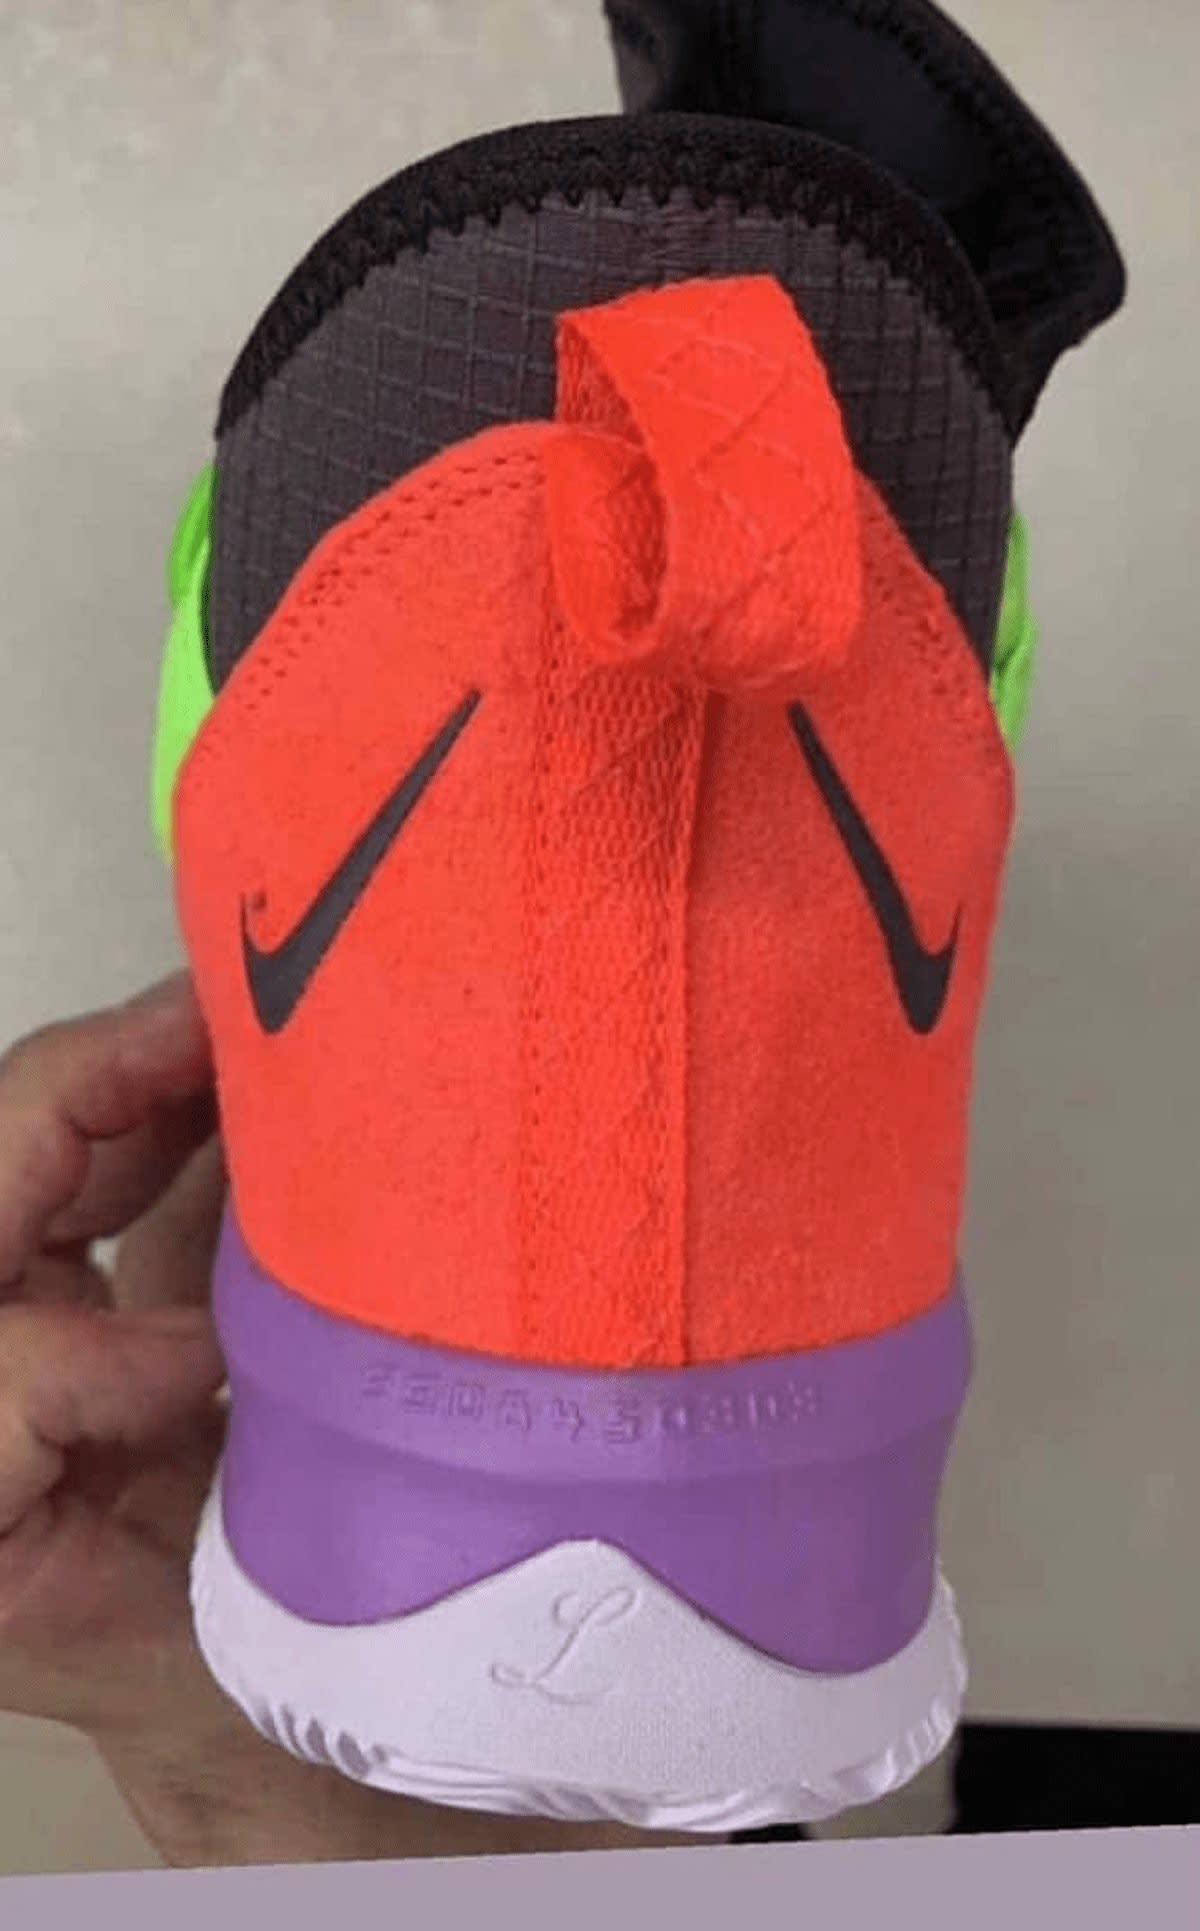 Nike LeBron Soldier 13 Heel